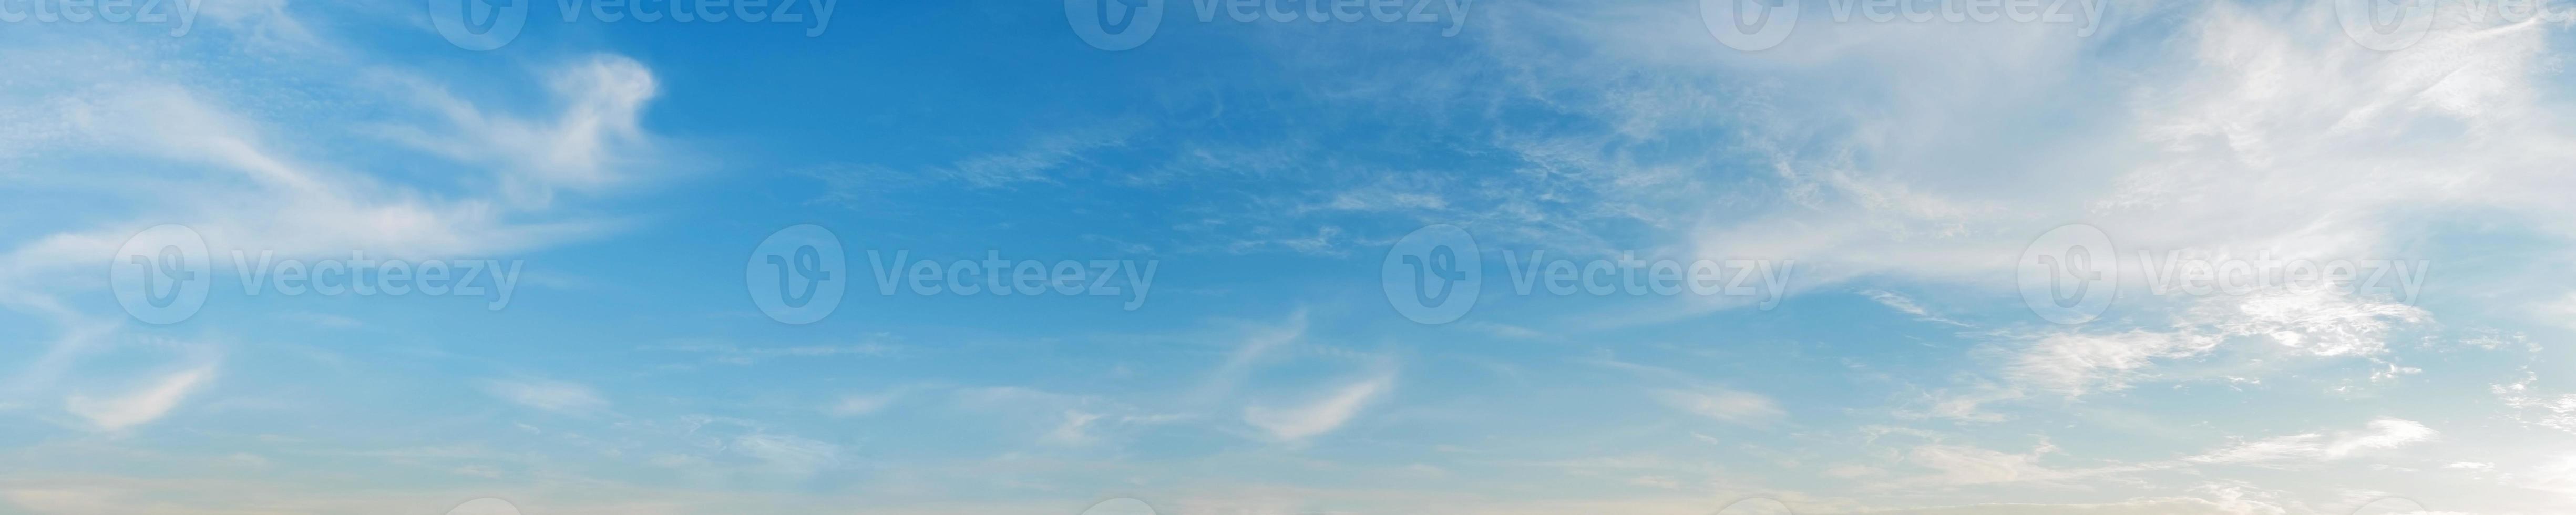 himmel med moln på en solig dag foto